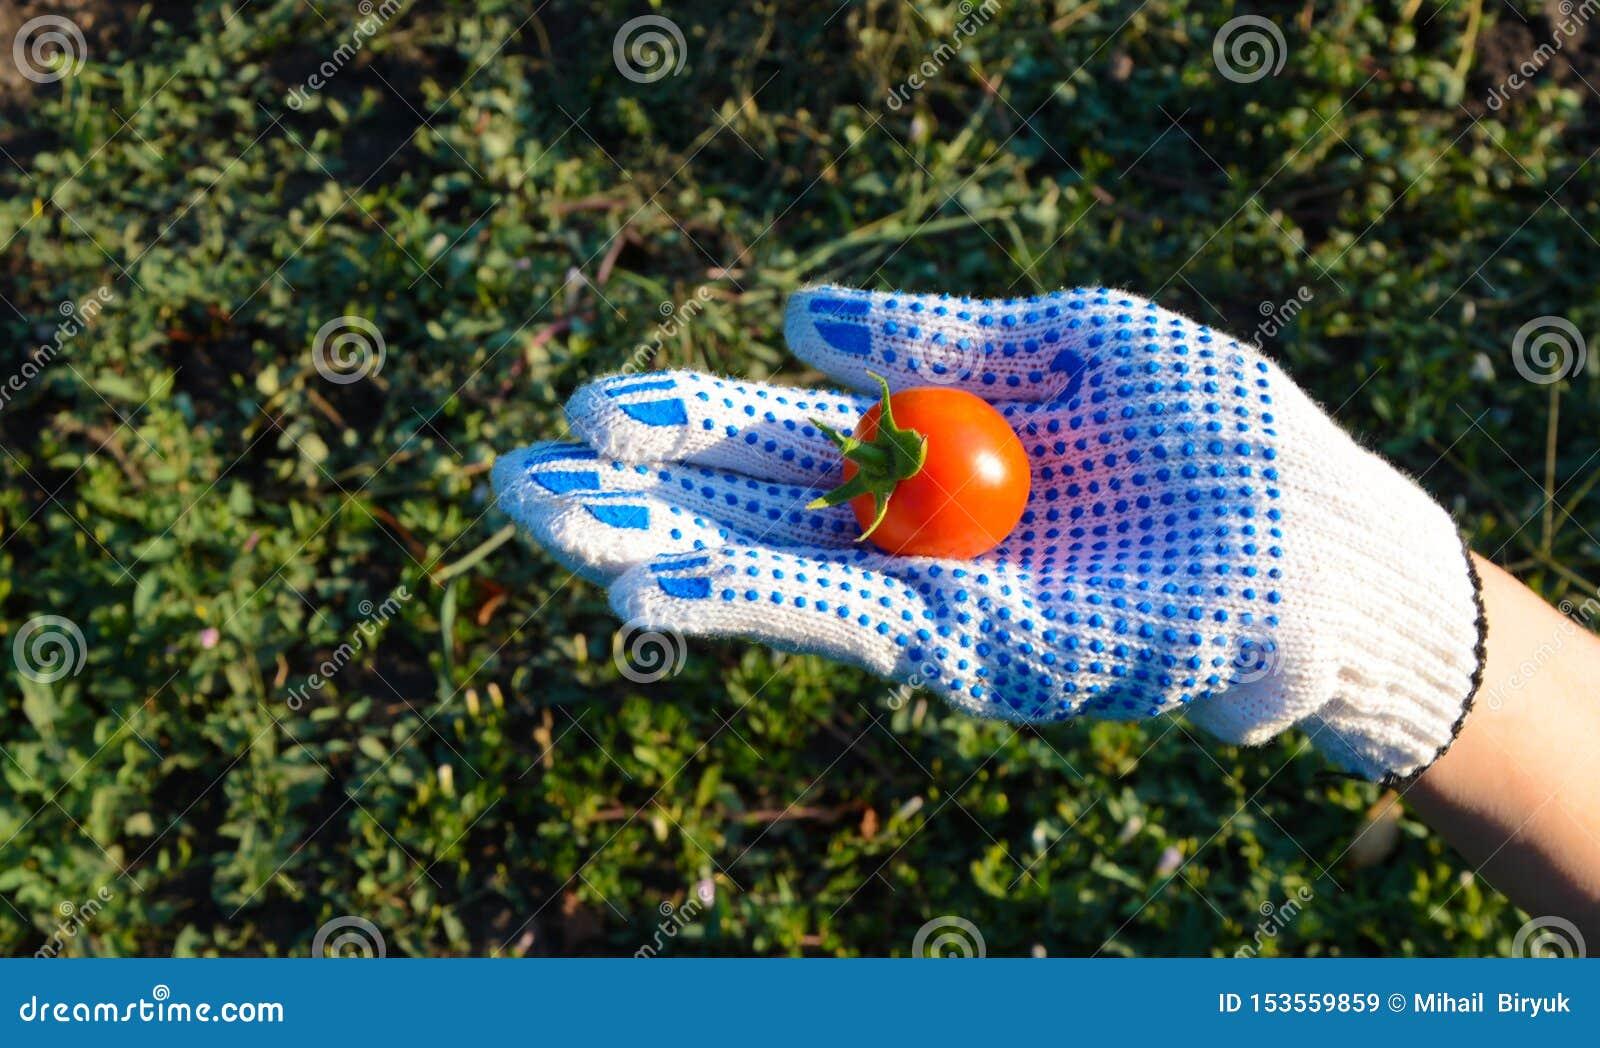 Tomates pequenos Vitamina-ricos apenas arrancados Alimento, vegetais, agricultura